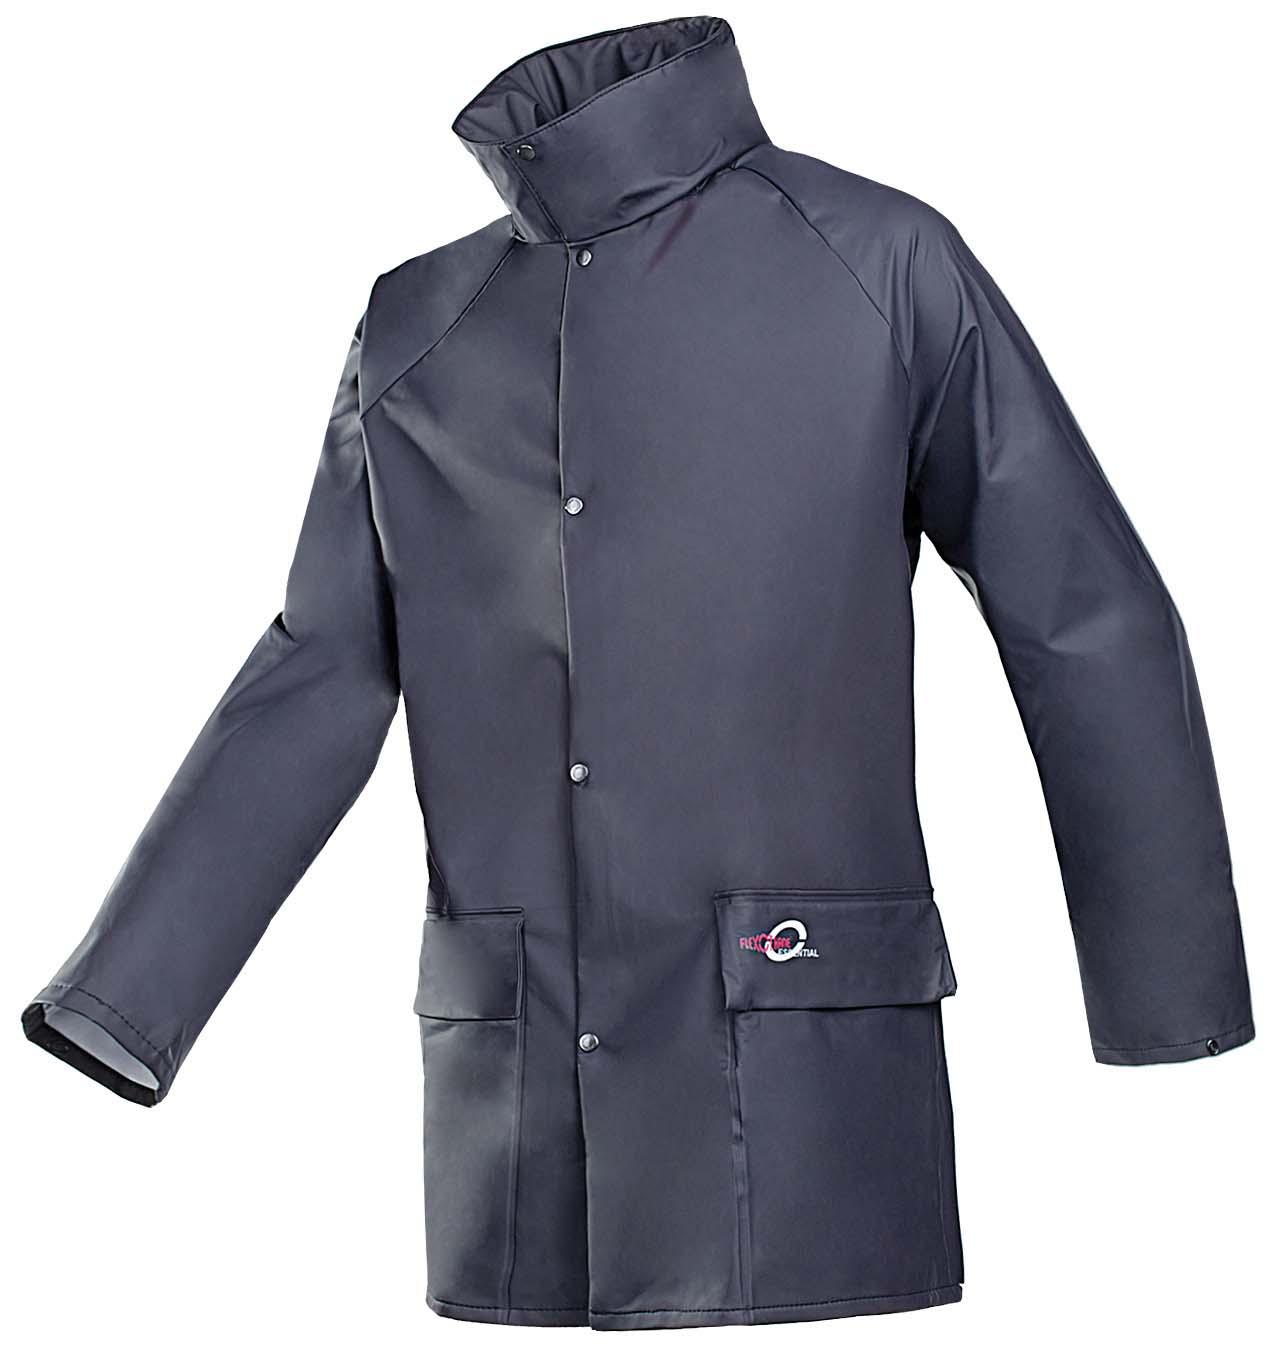 Jacket Navy Flexothane  (M) 4145 Bagged Sioen (Breathable Rain Jacket)